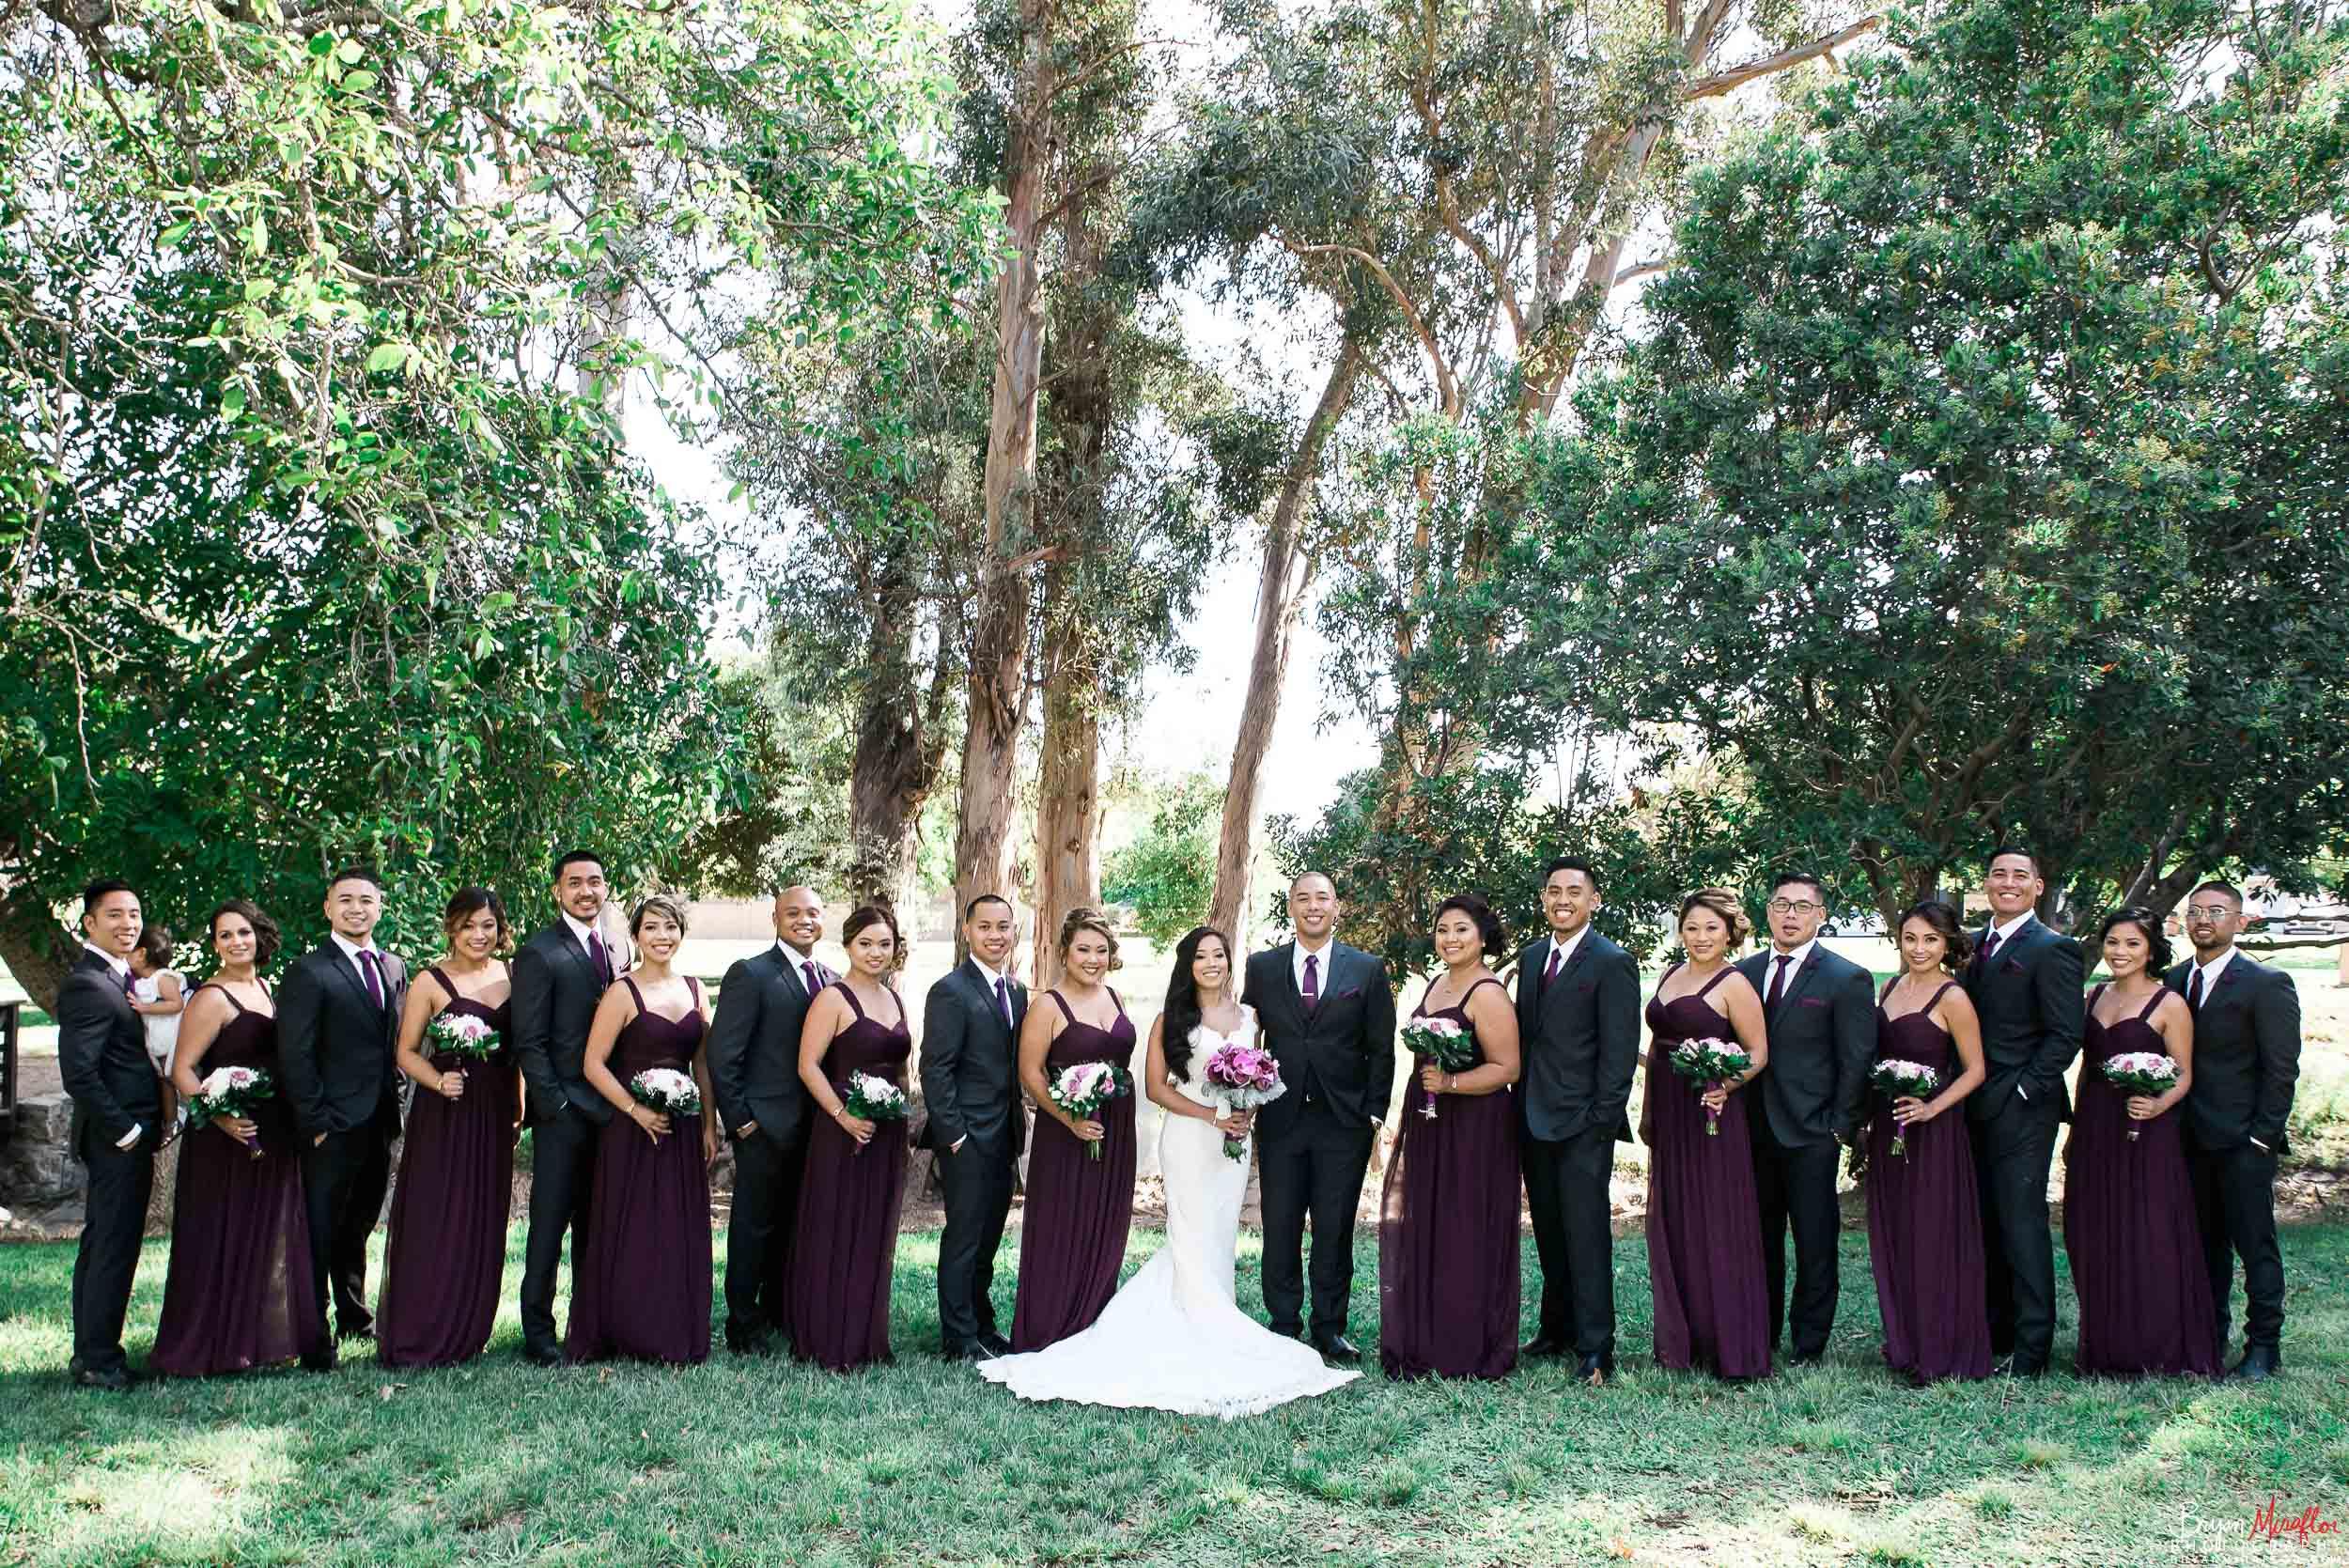 Bryan-Miraflor-Photography-Trisha-Dexter-Married-20170923-024.jpg